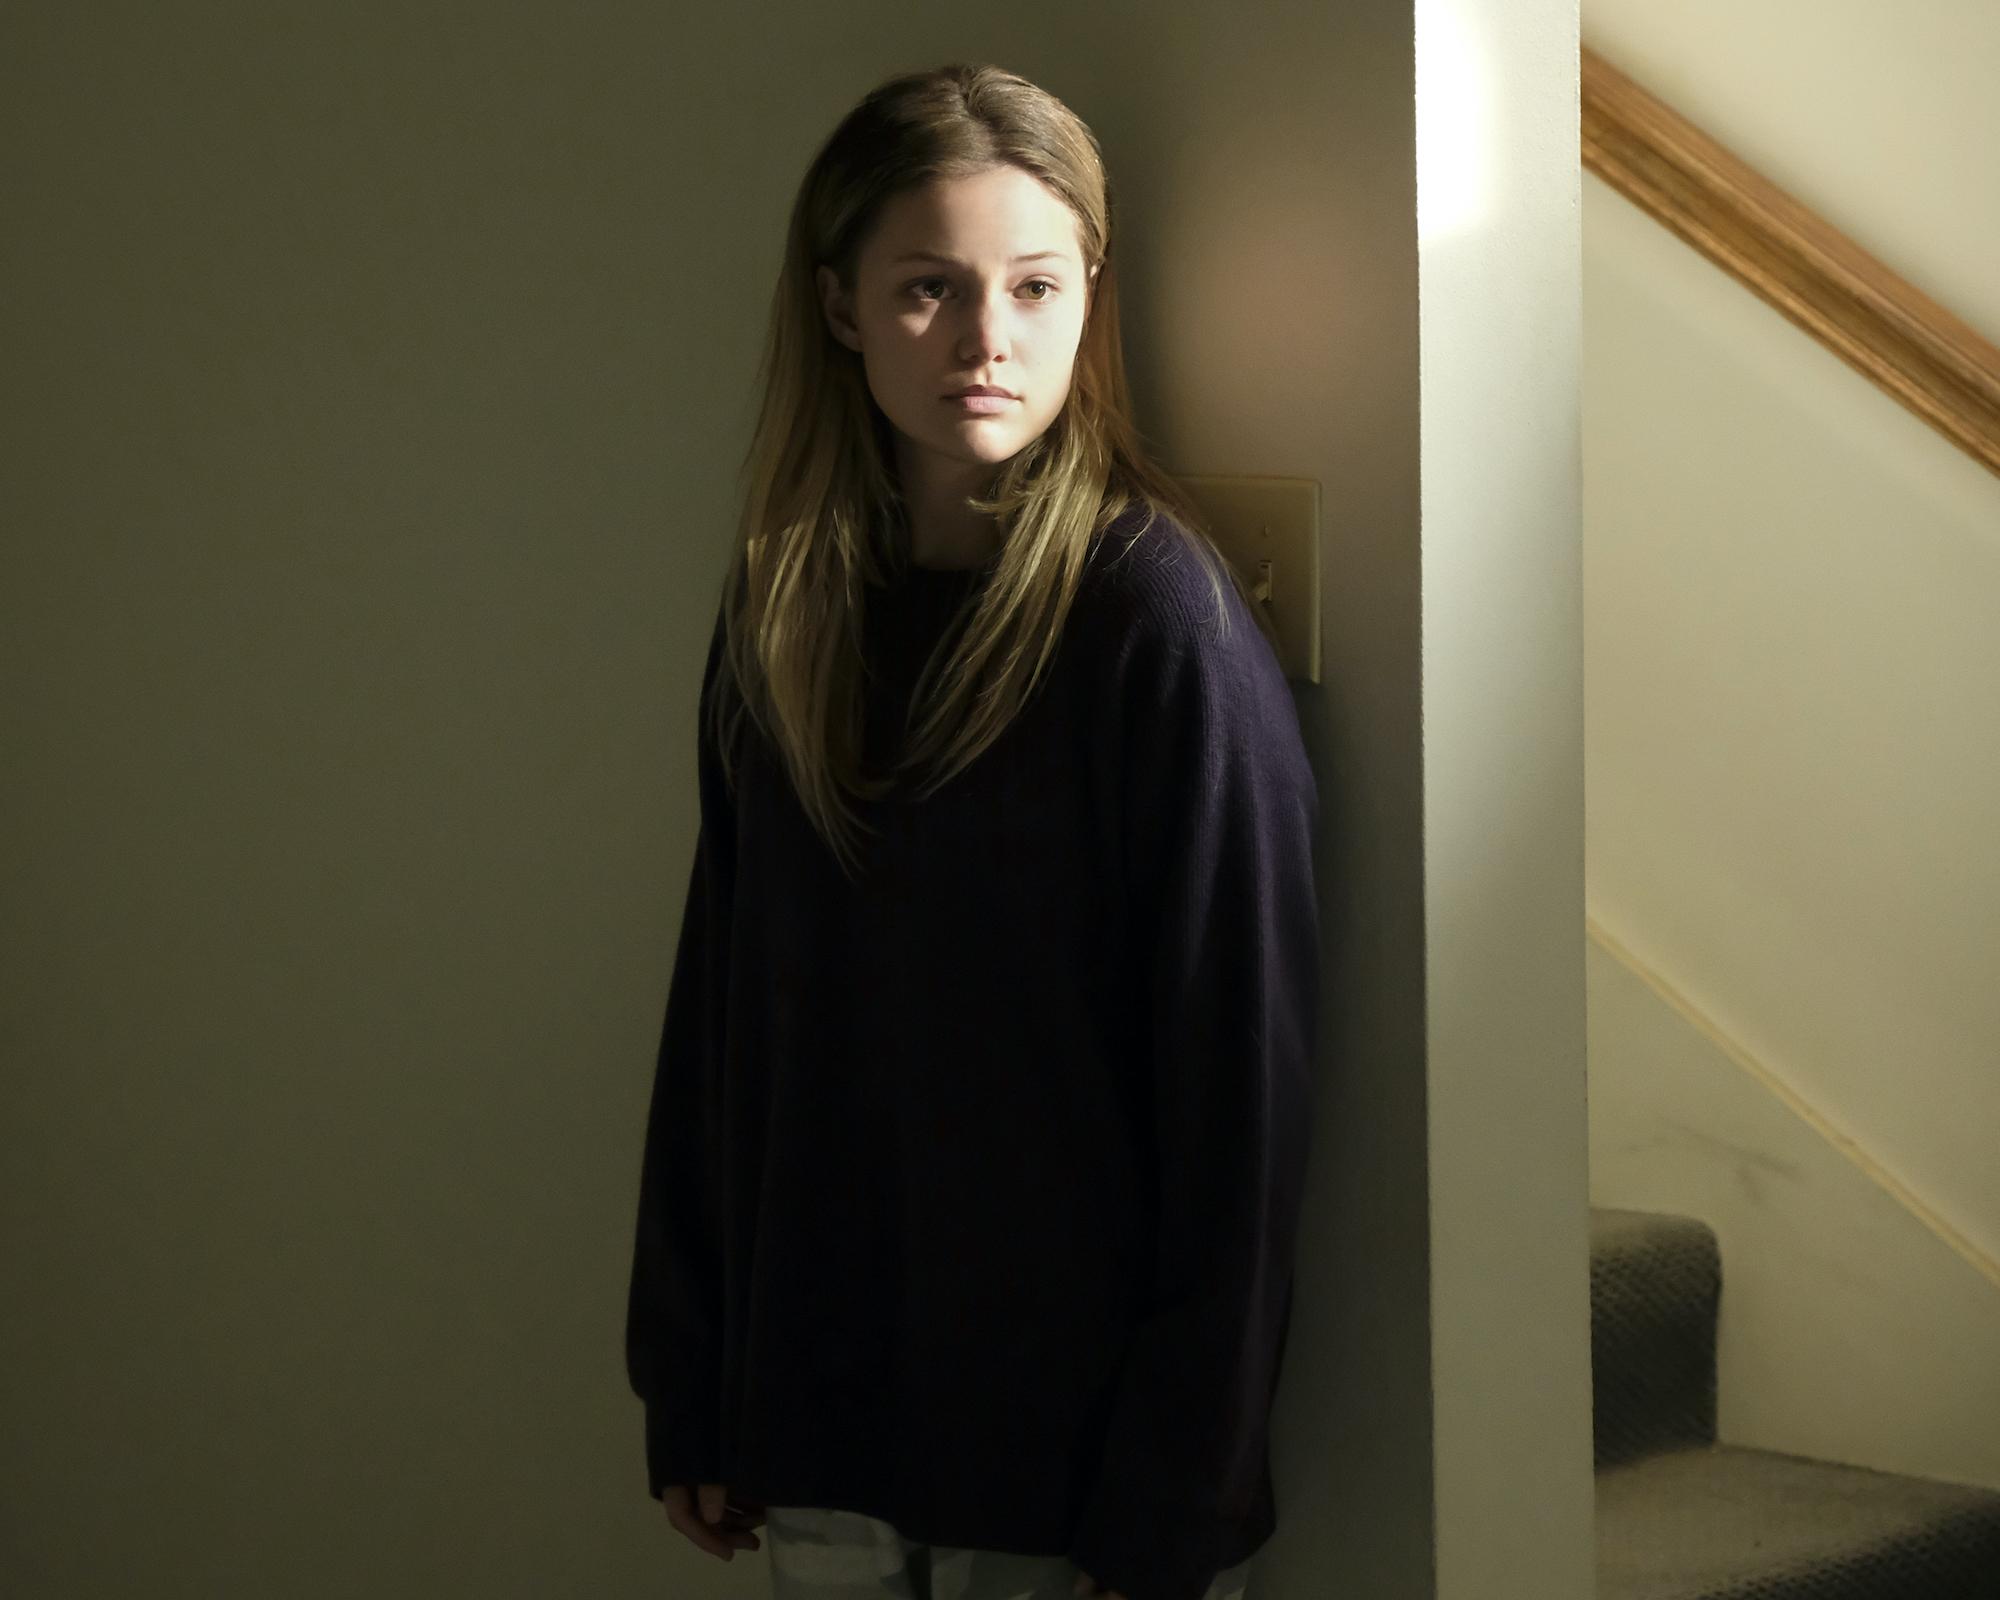 "'CRUEL SUMMER' episode 4 ""You Don't Hunt, You Don't Eat"": Olivia Holt as Kate Wallis"